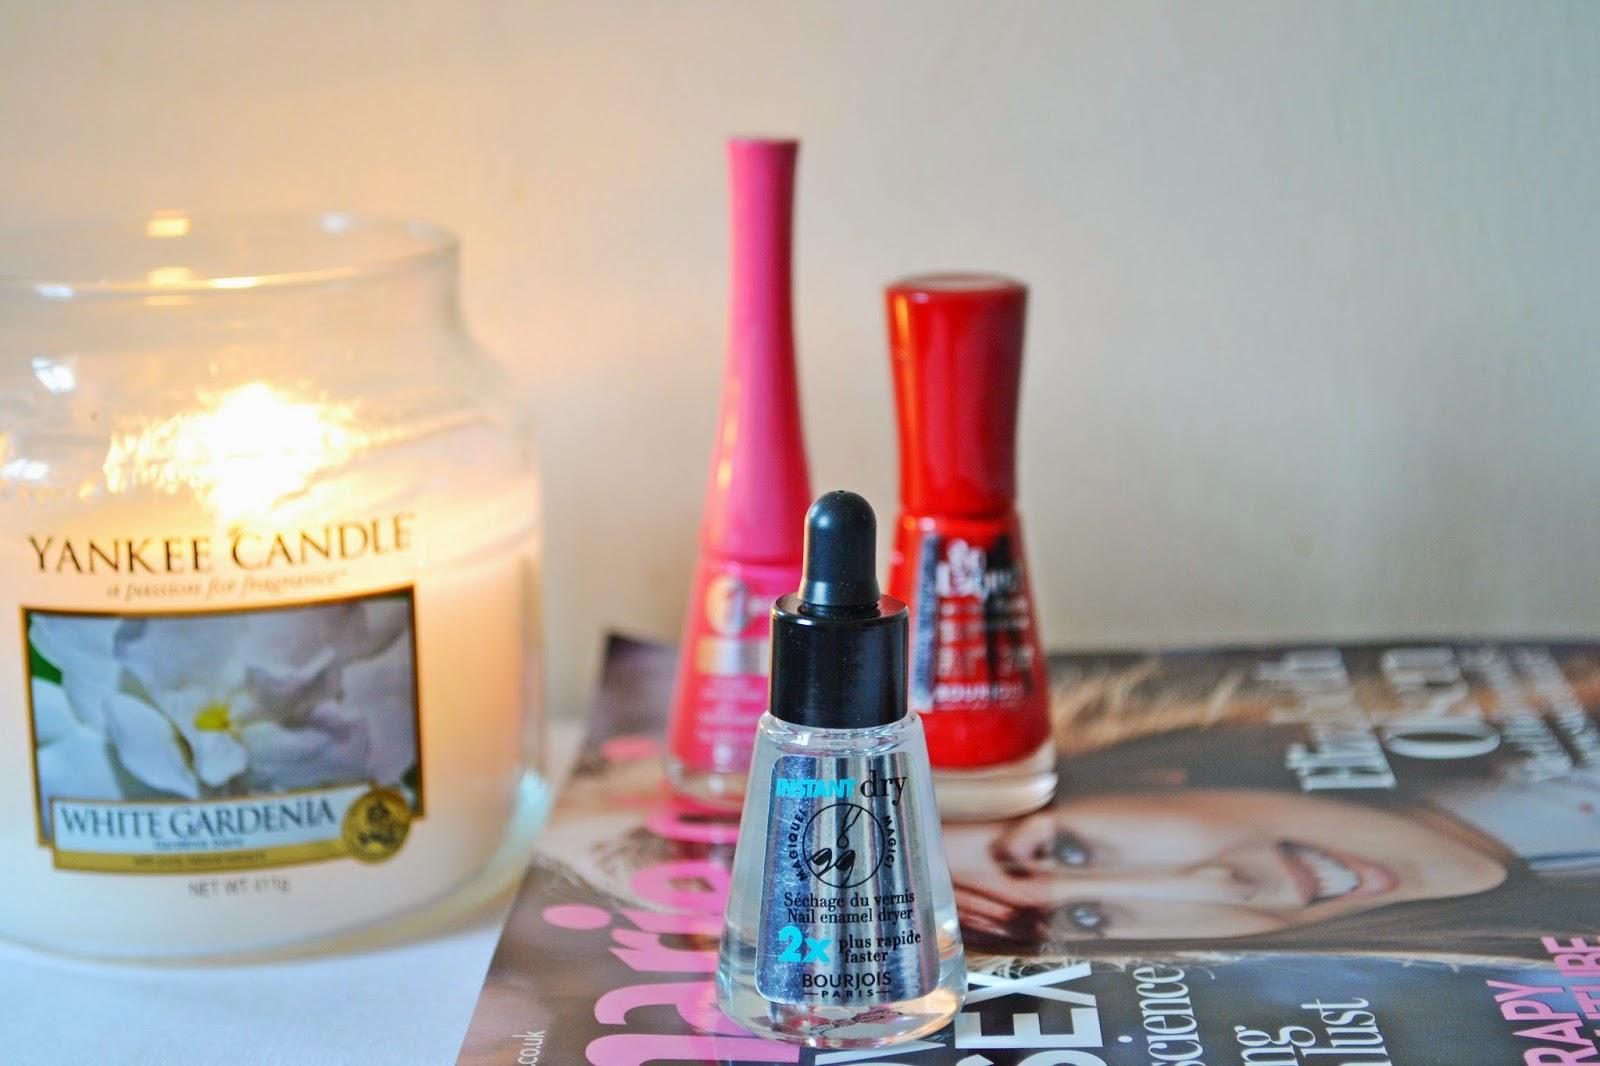 Bourjois Instant Dry Nail Drops - Aspiring Londoner